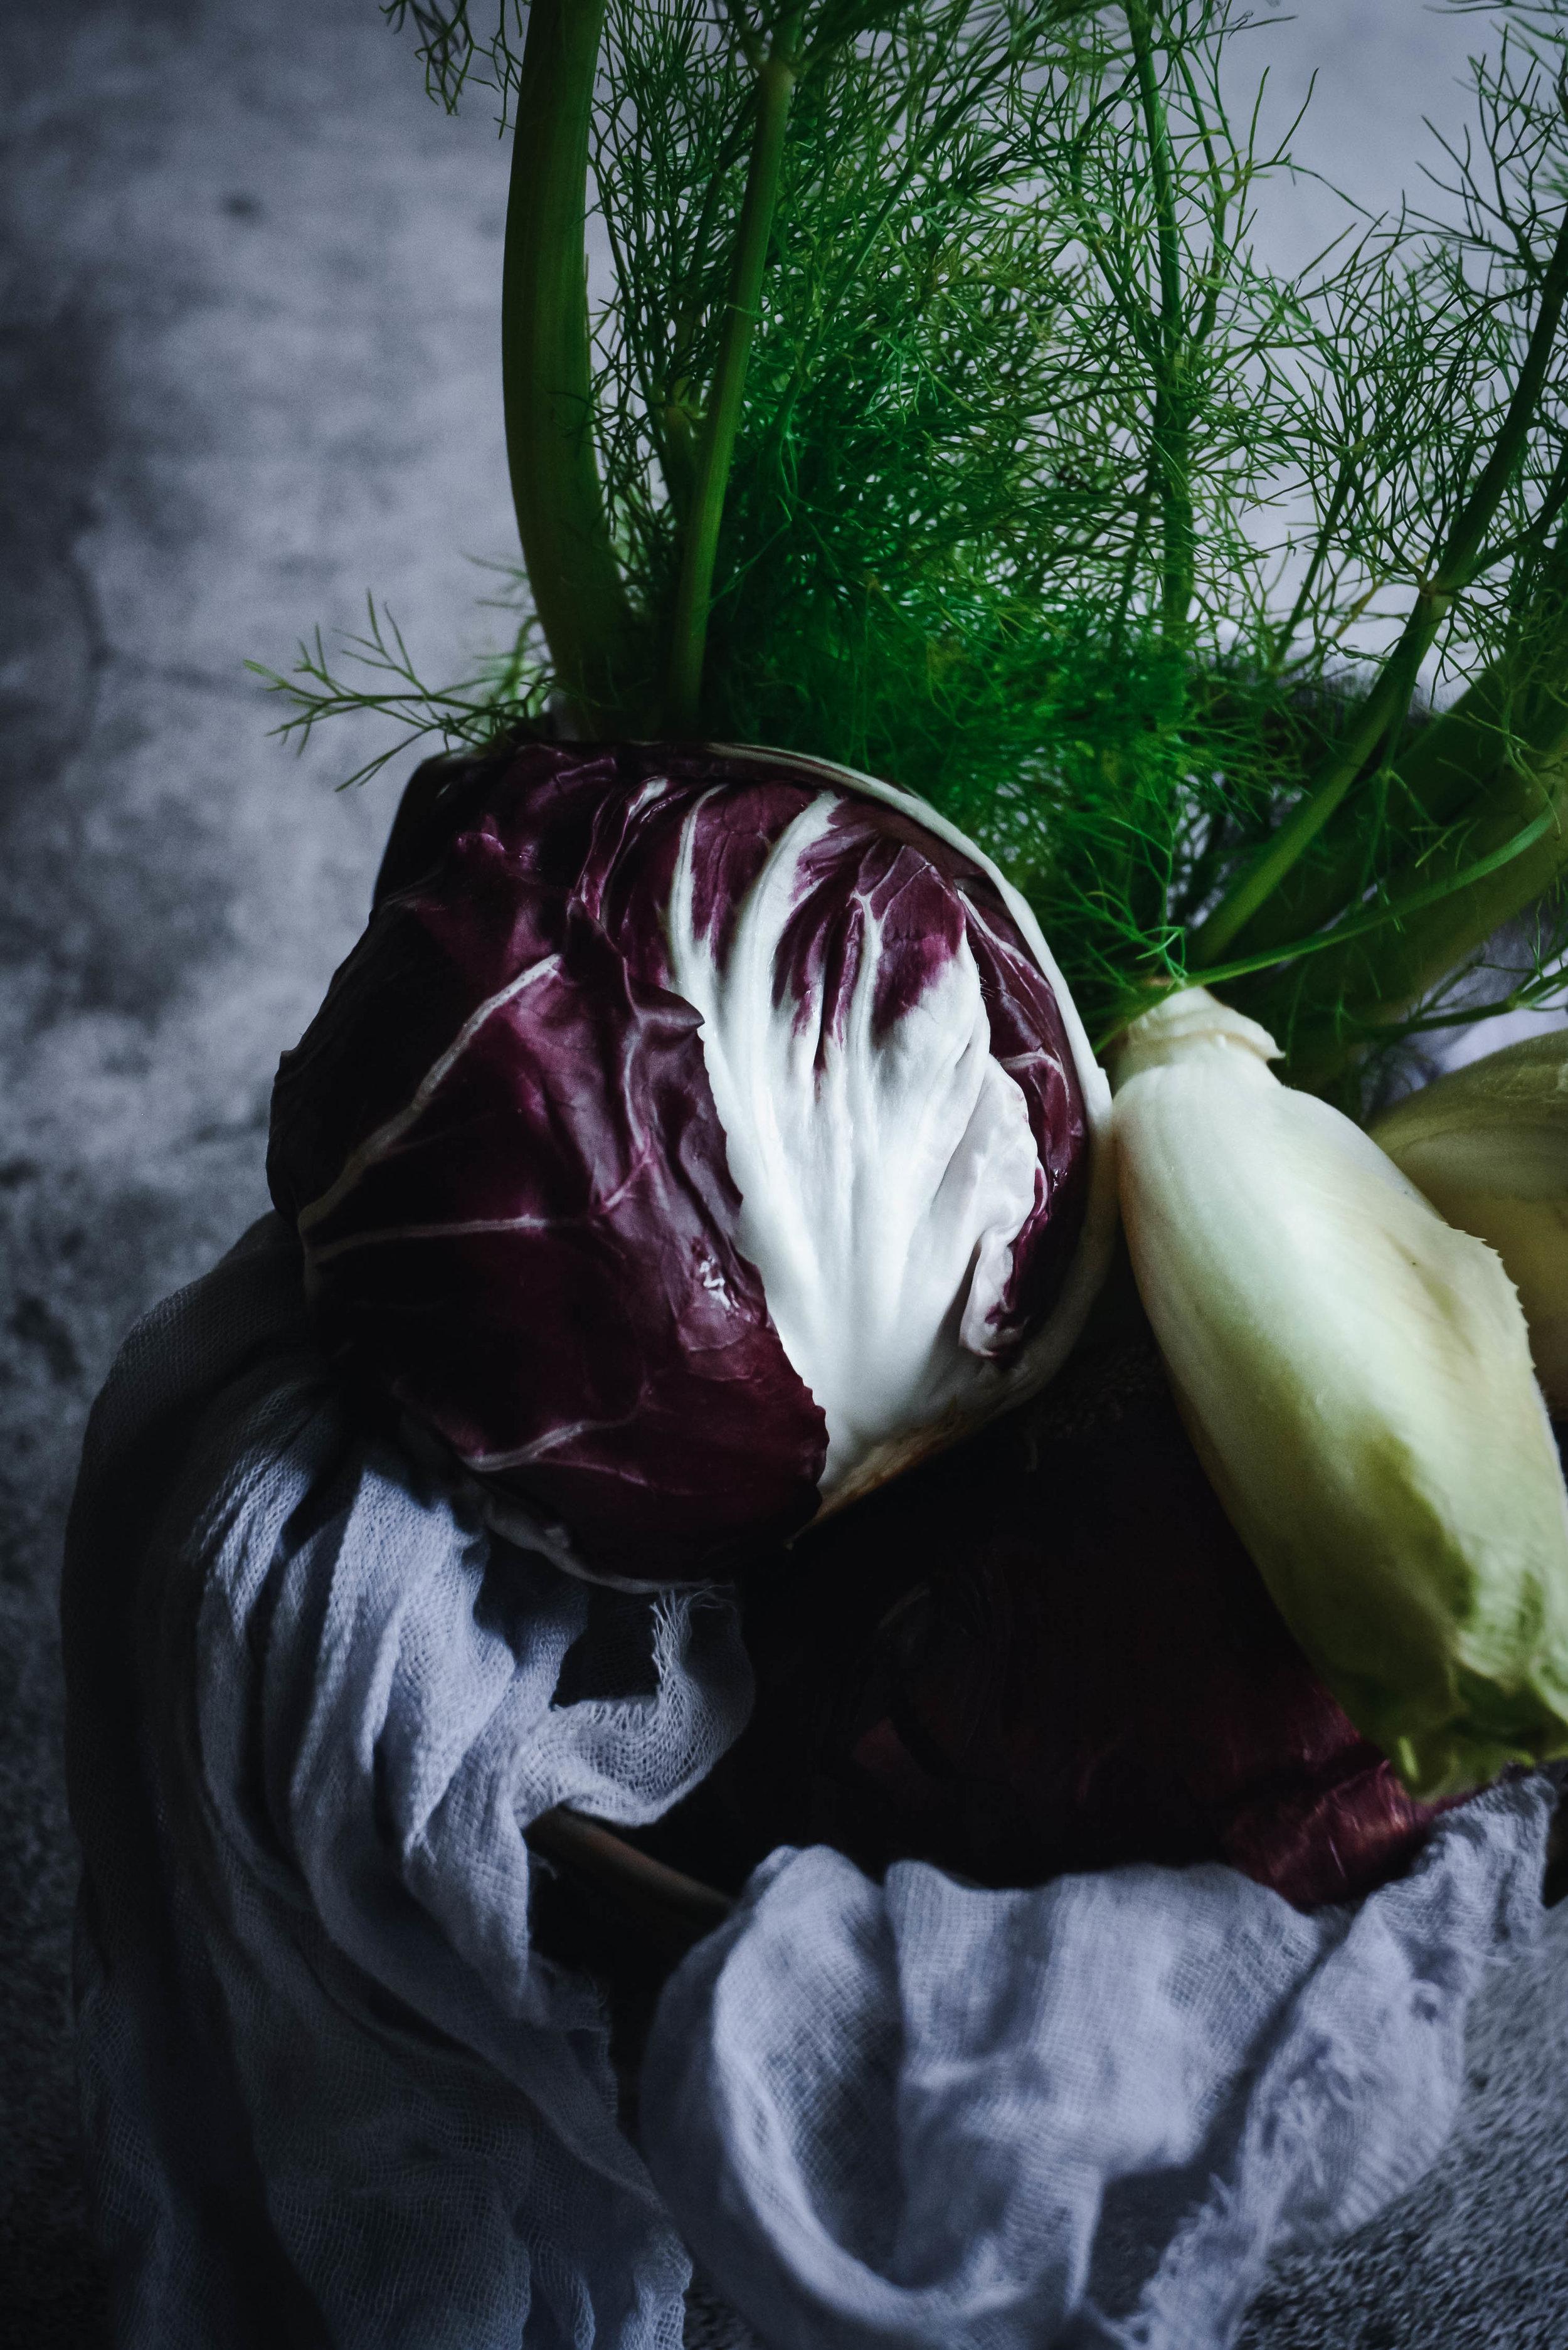 Radicchio, endive and fennel on napkin